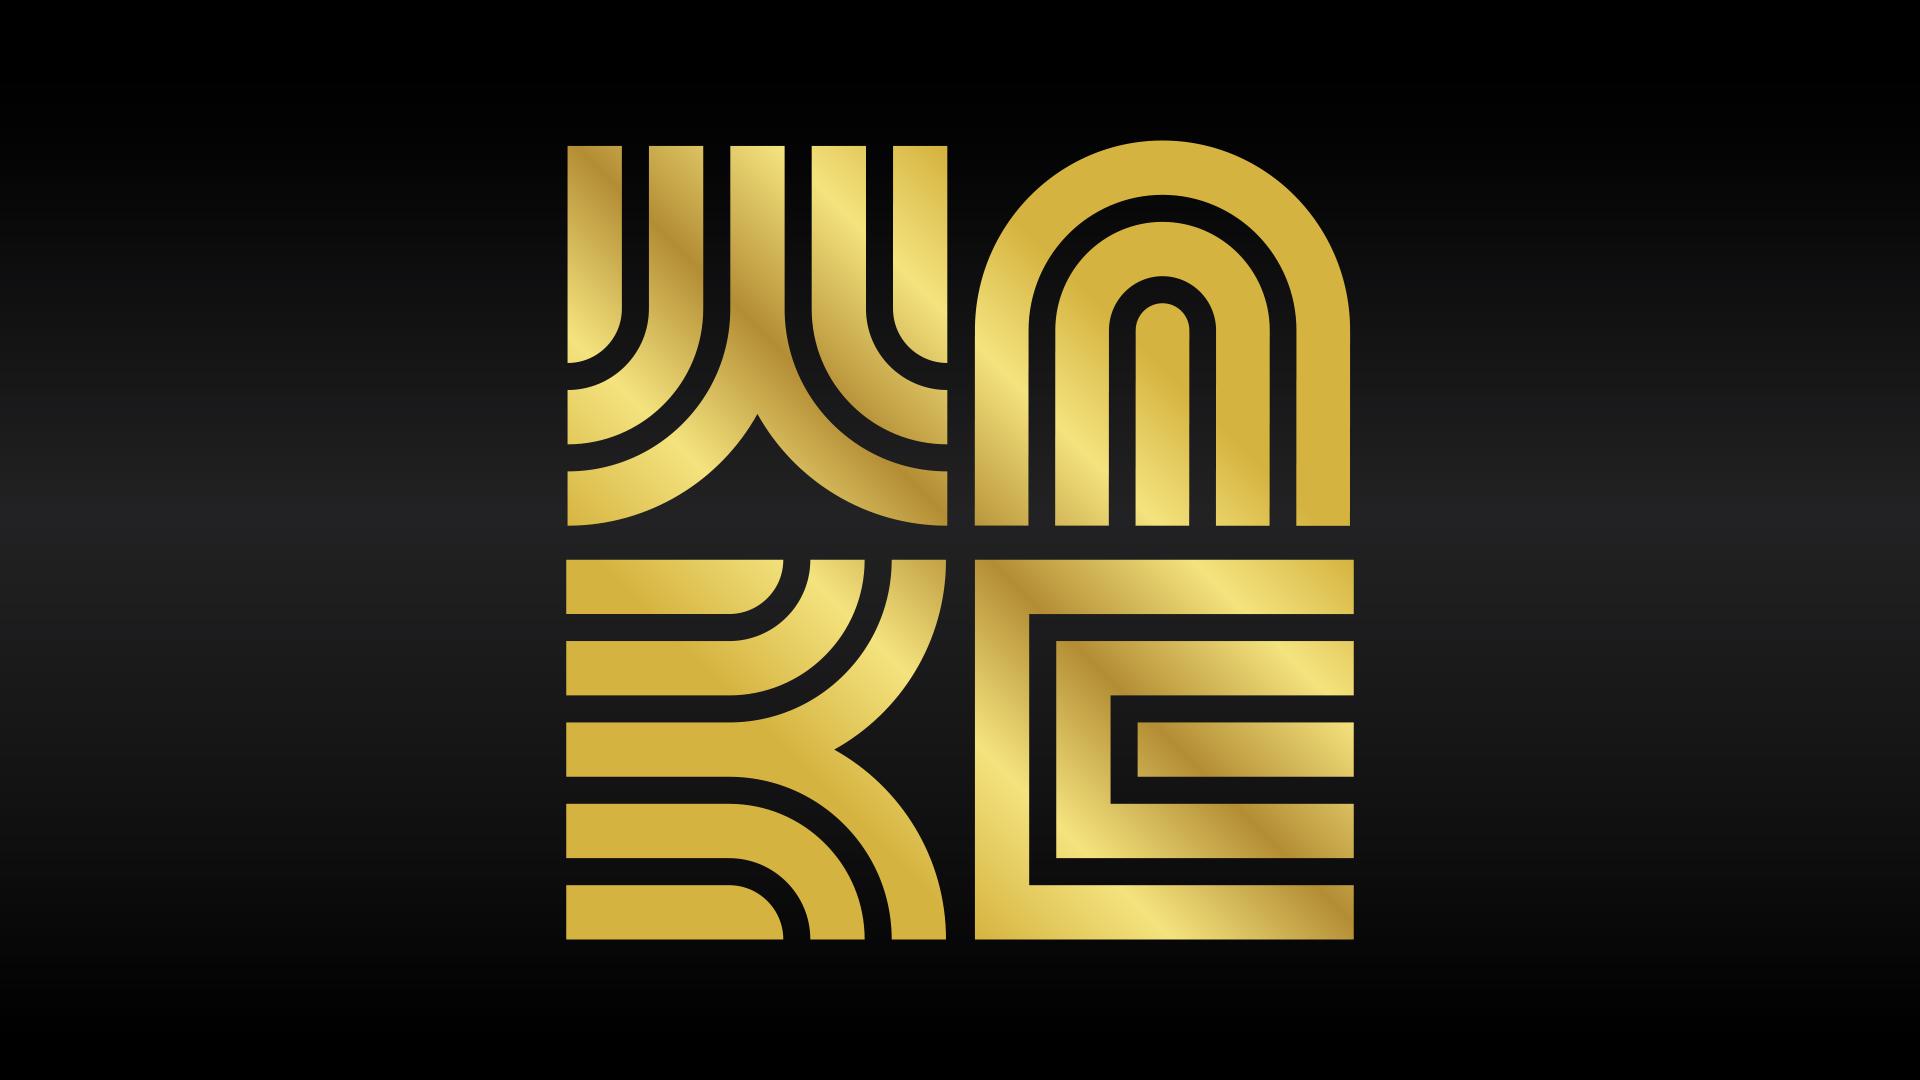 WAKE Logo wallpaper